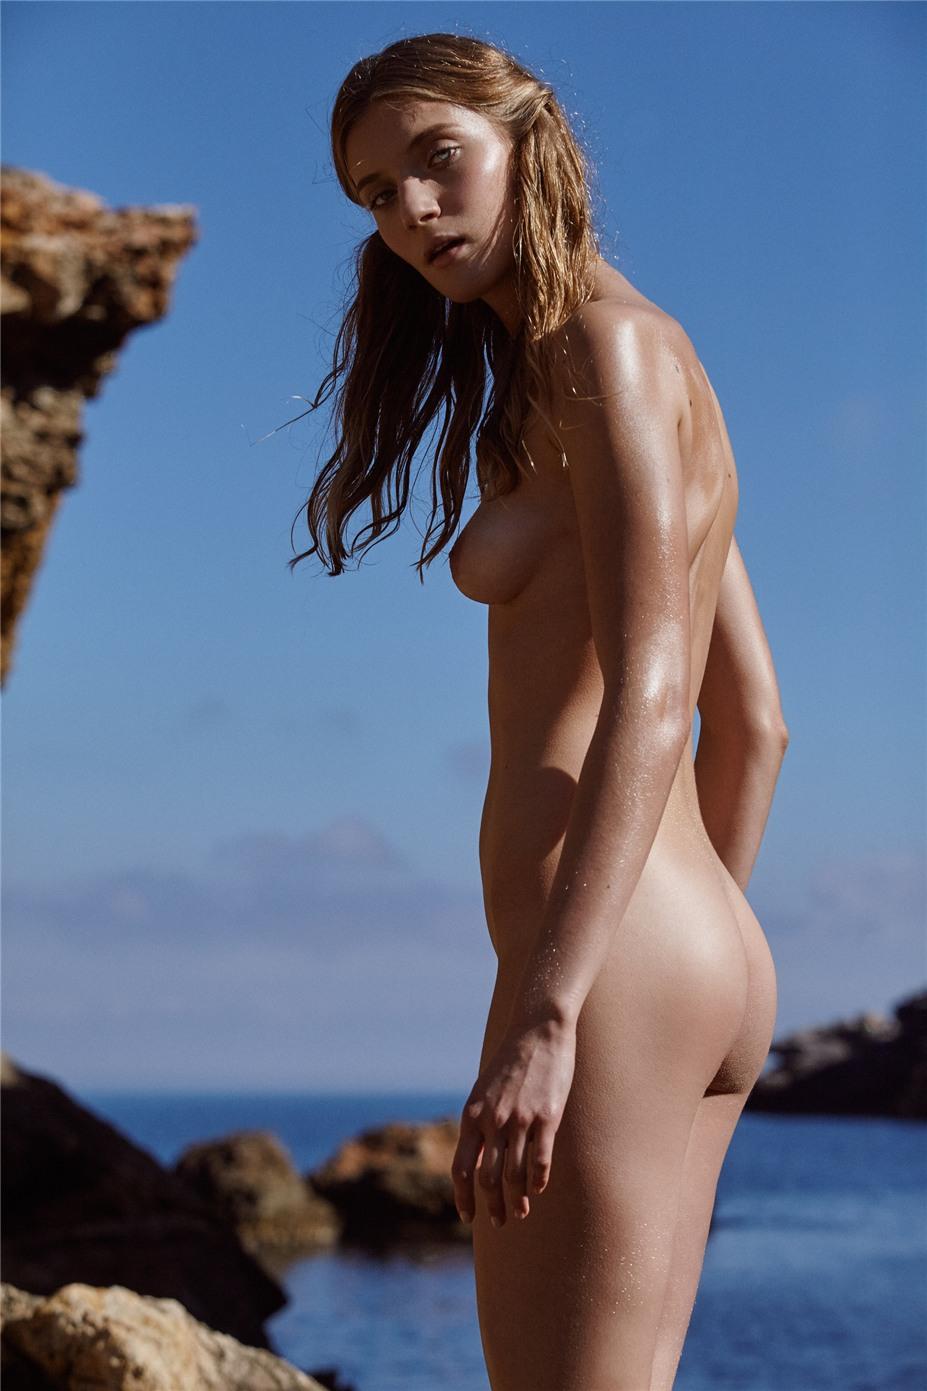 Обнаженные девушки на пляжах Ибицы / Ibiza Nudes by Diane Betties - Caro